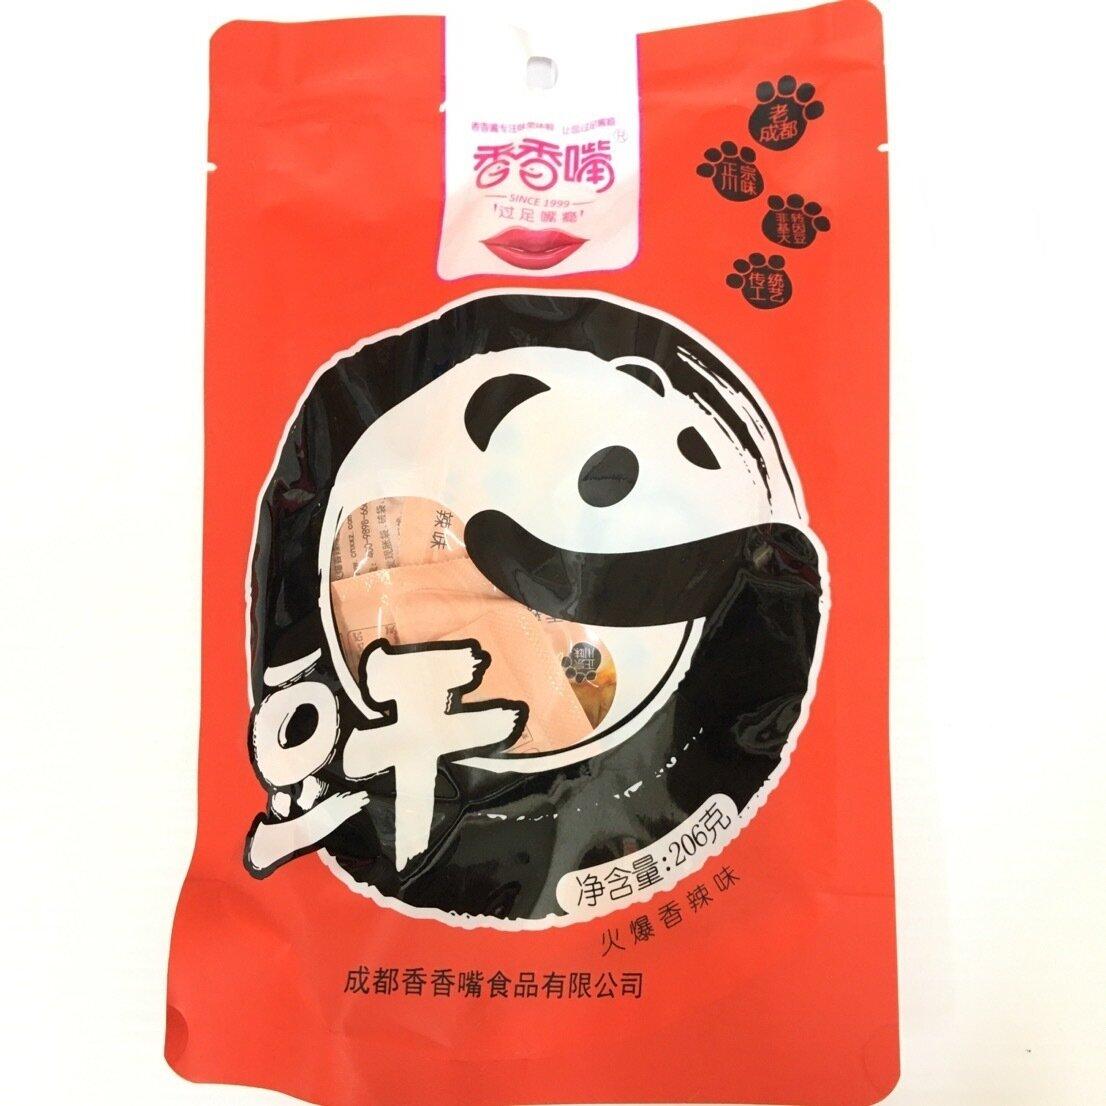 GROC【杂货】香香嘴 火爆香辣味 206g